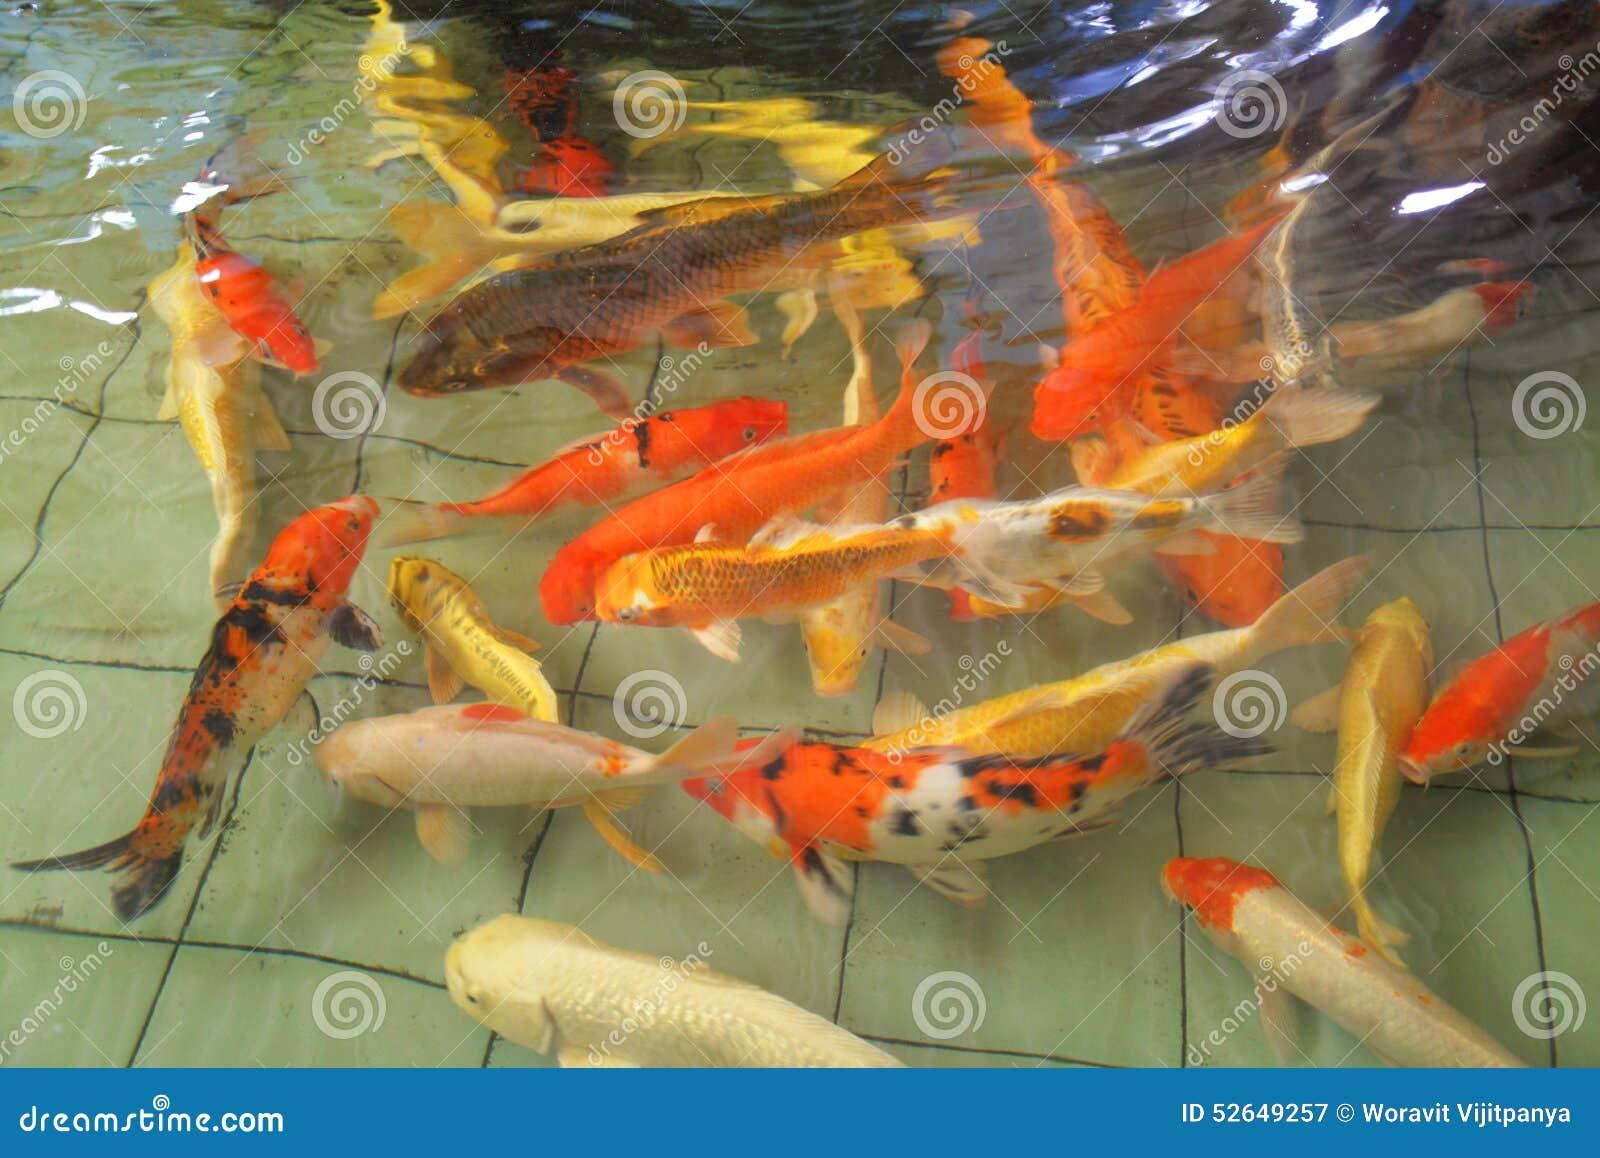 Koi fish stock photo image 52649257 for Beautiful koi fish